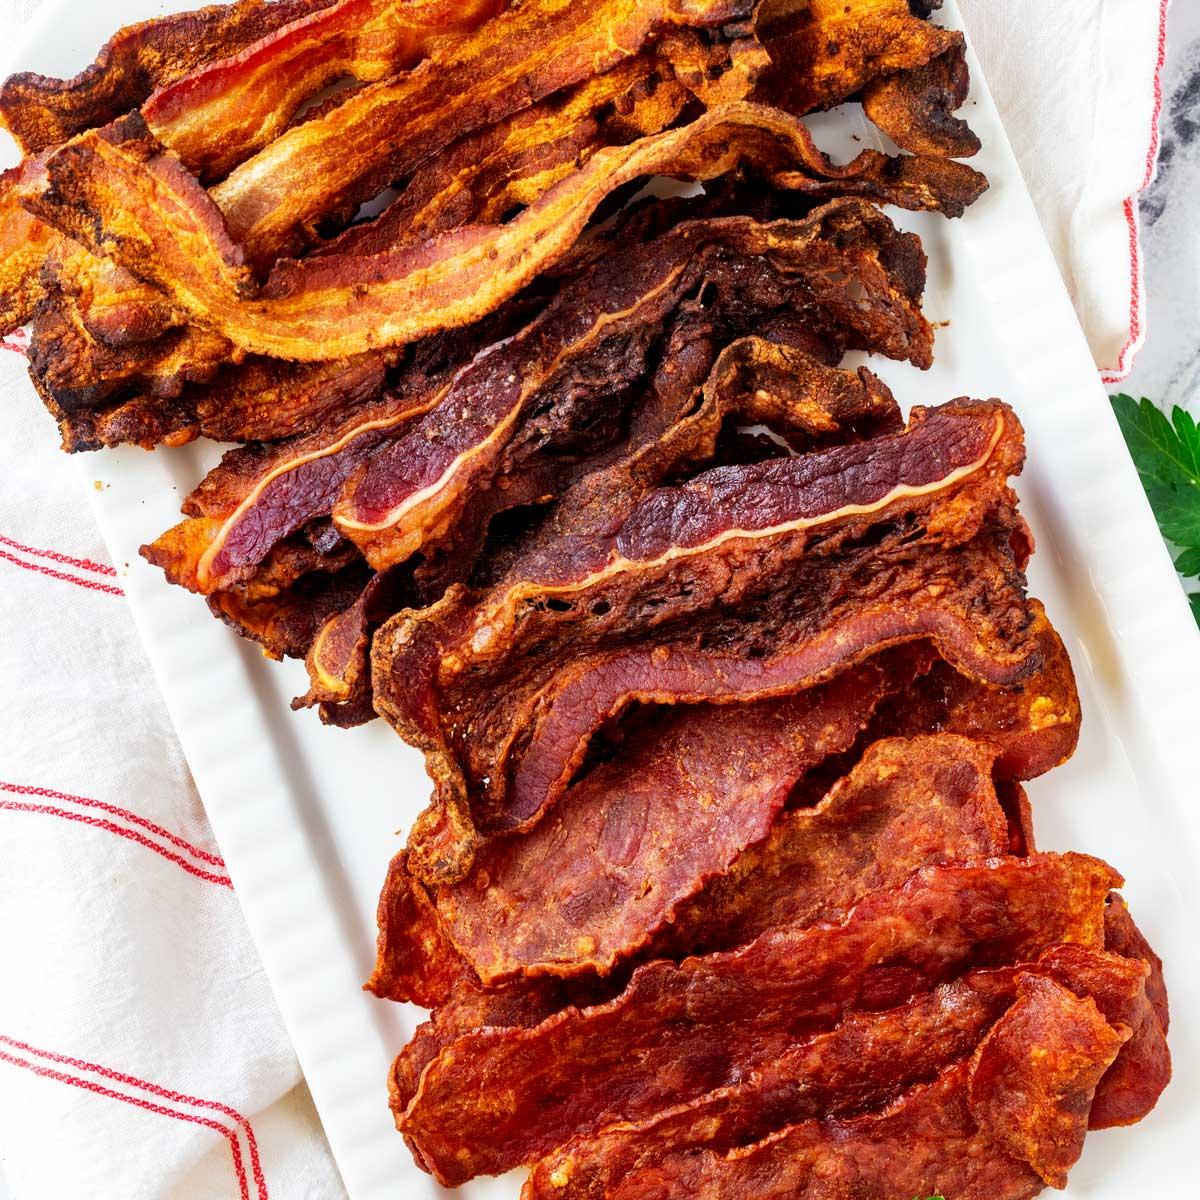 Square photo of ninja foodi grill bacon - turkey bacon, beef bacon and pork bacon.